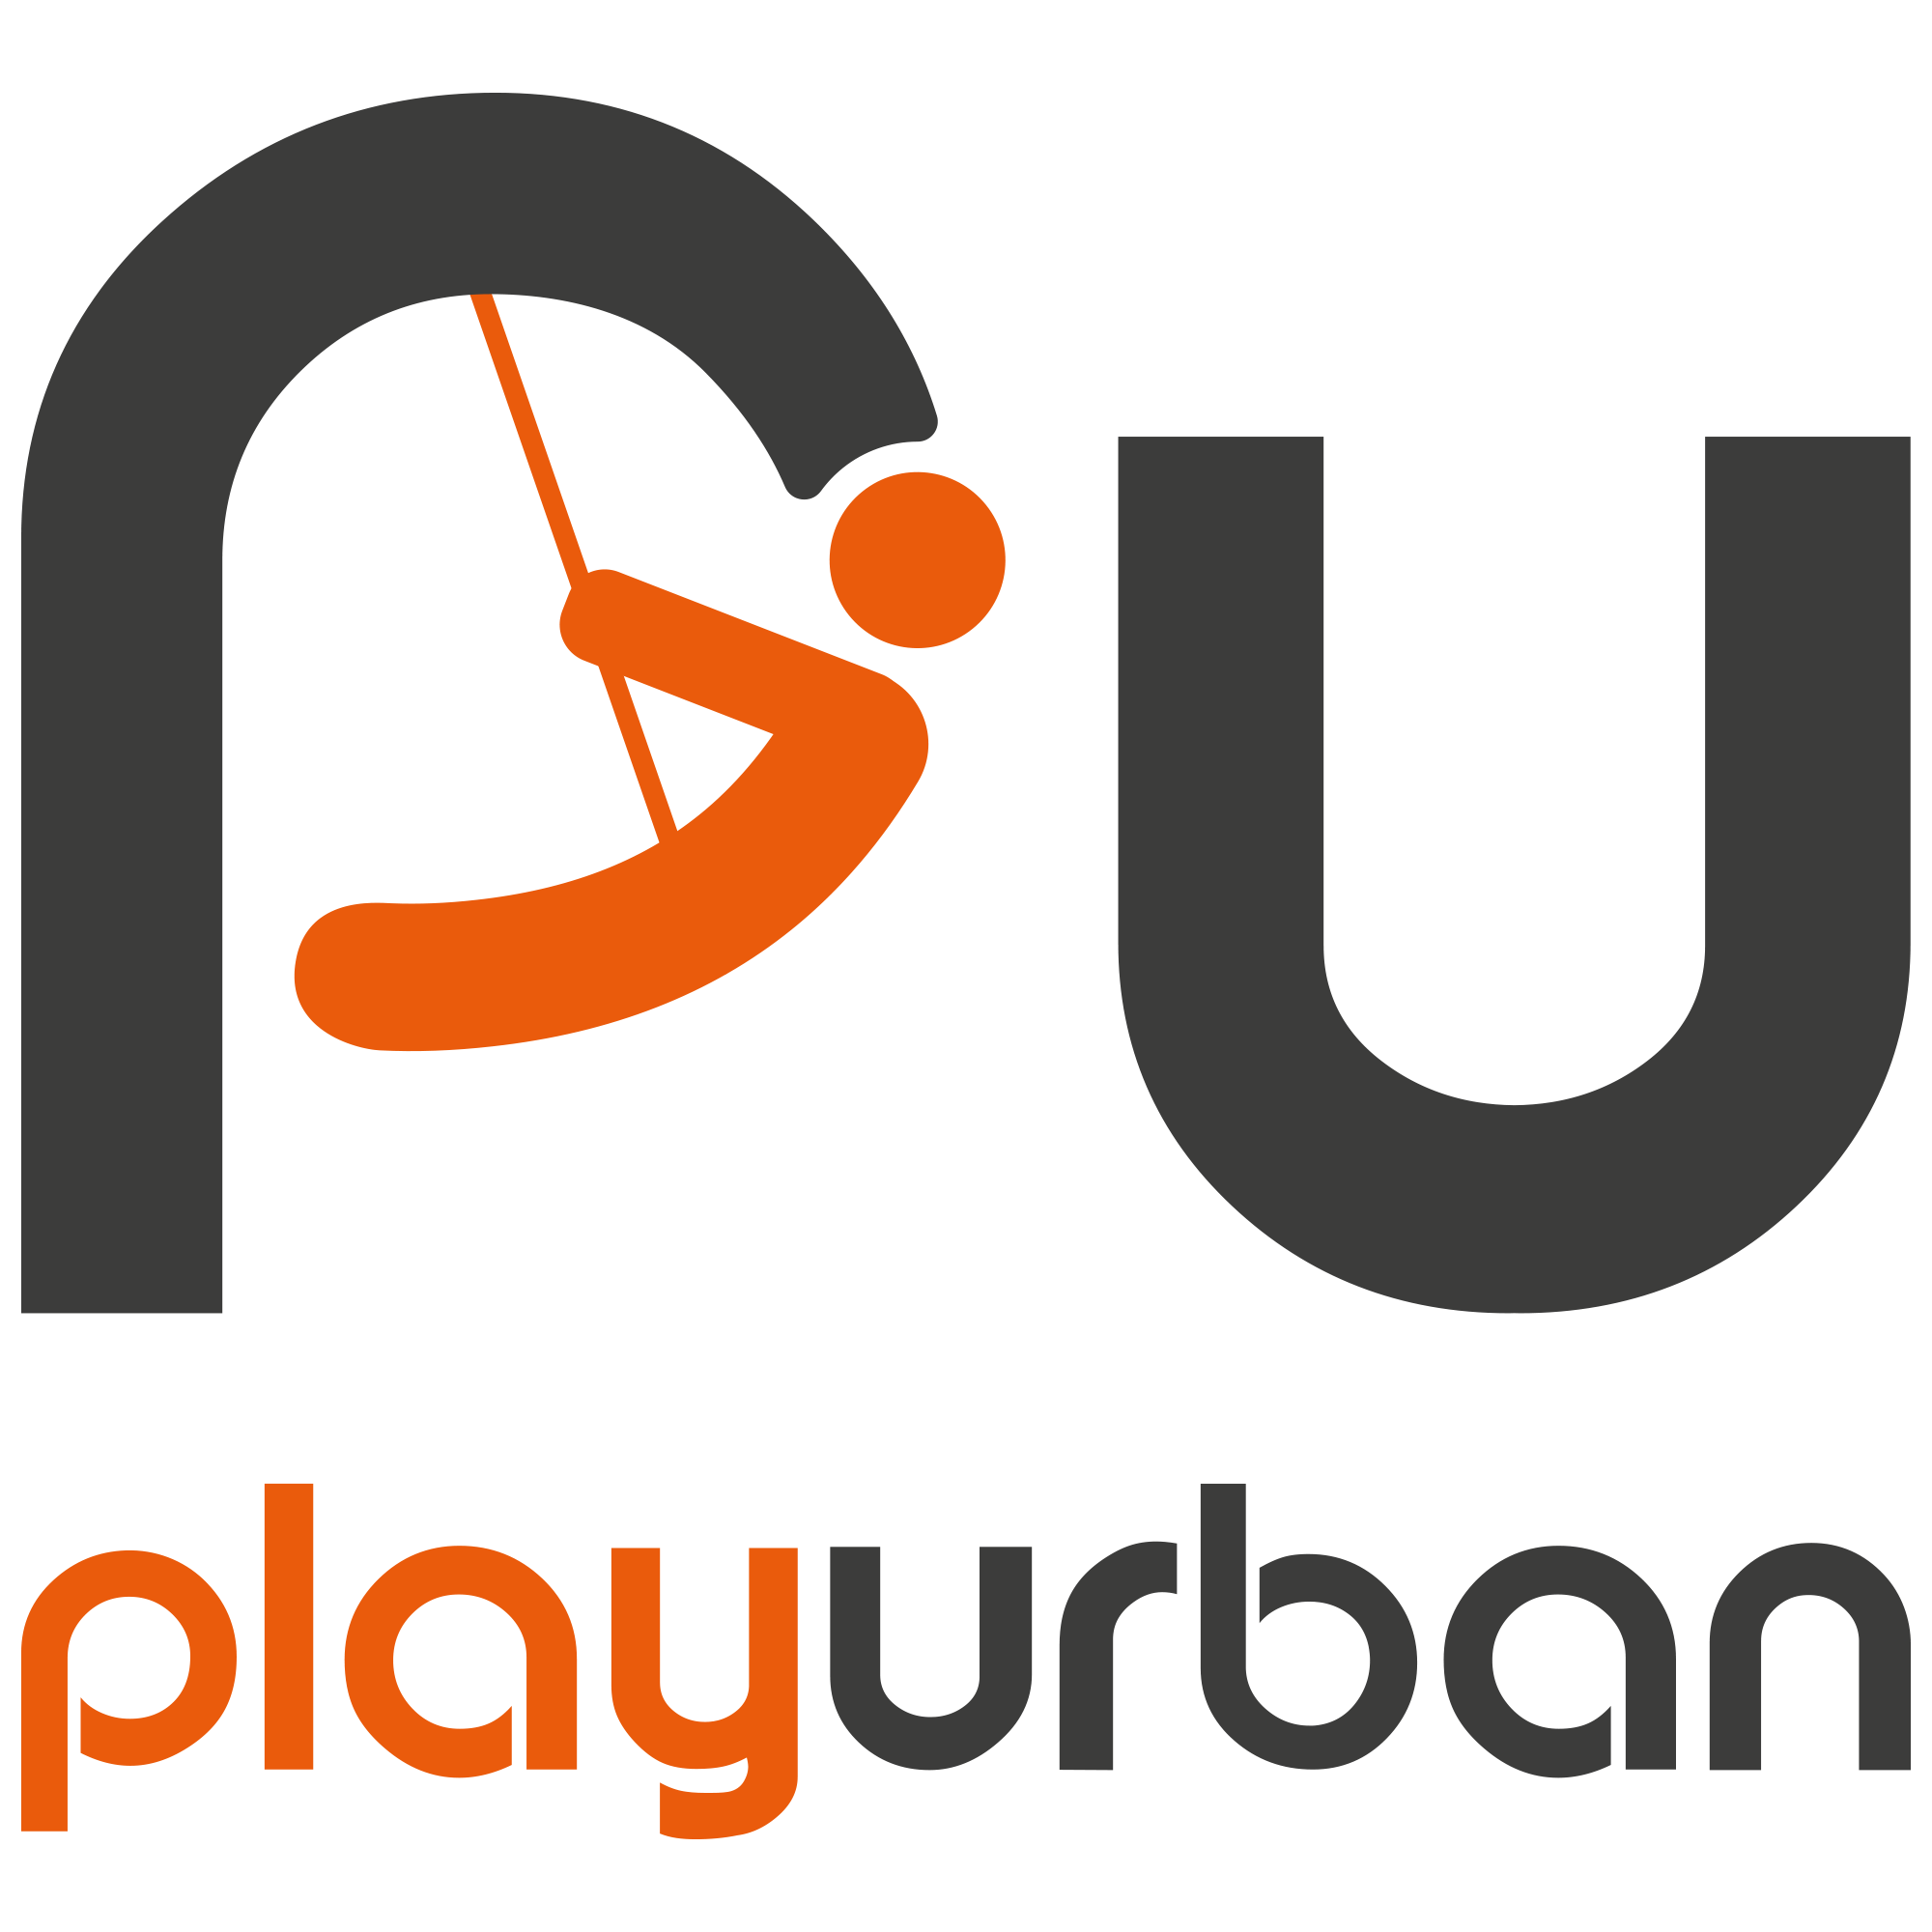 Play Urban